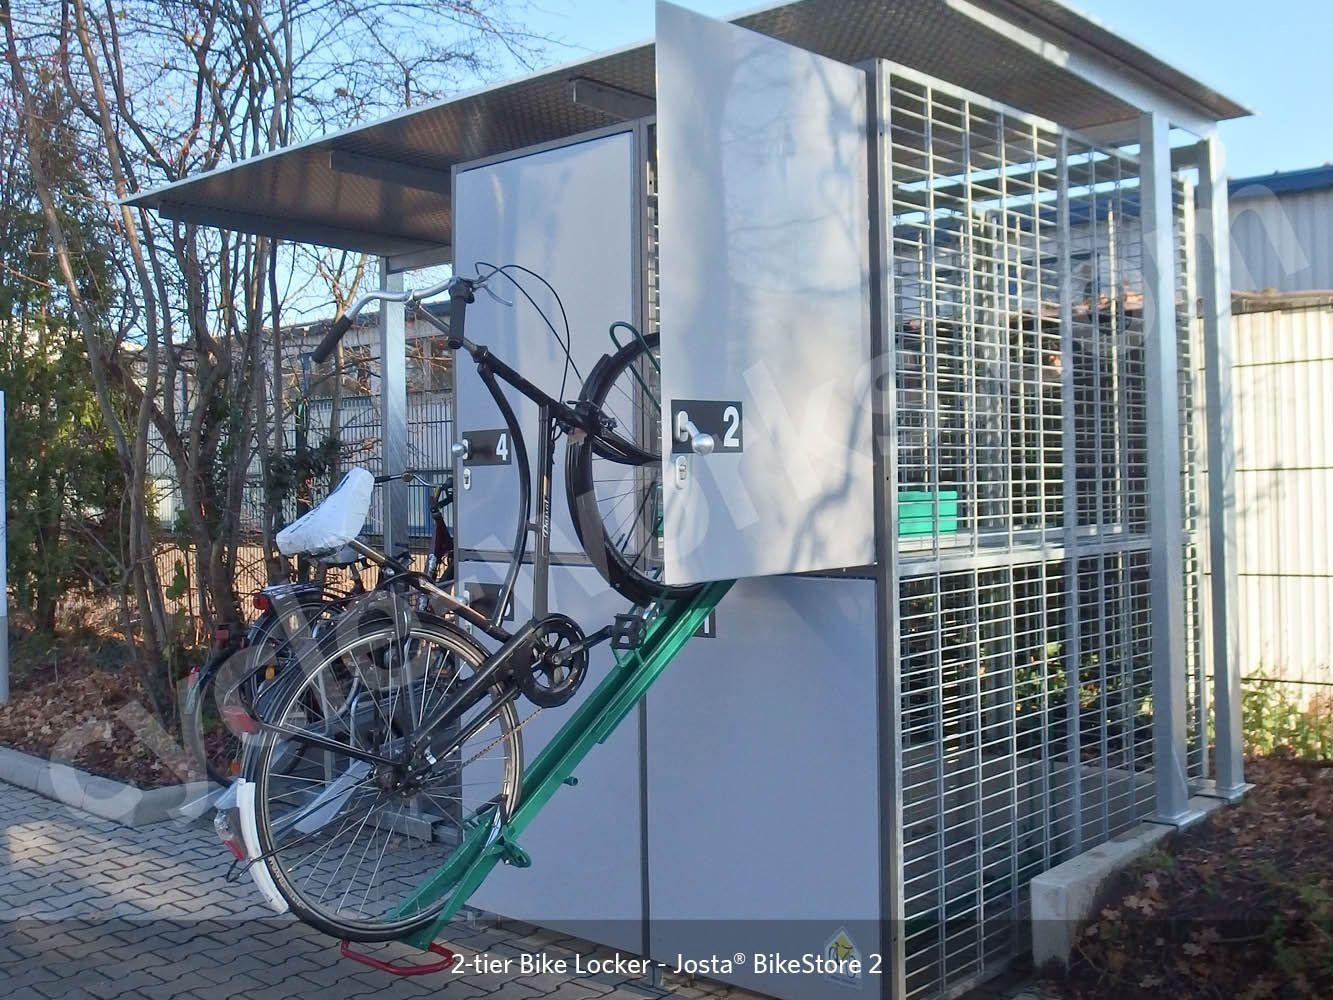 2 Tier Bike Locker Josta Bikestore2 Cycle Works Limited Bike Lockers Bike Storage Bike Sheds Bike Locker Bike Shed Craftsman Sheds